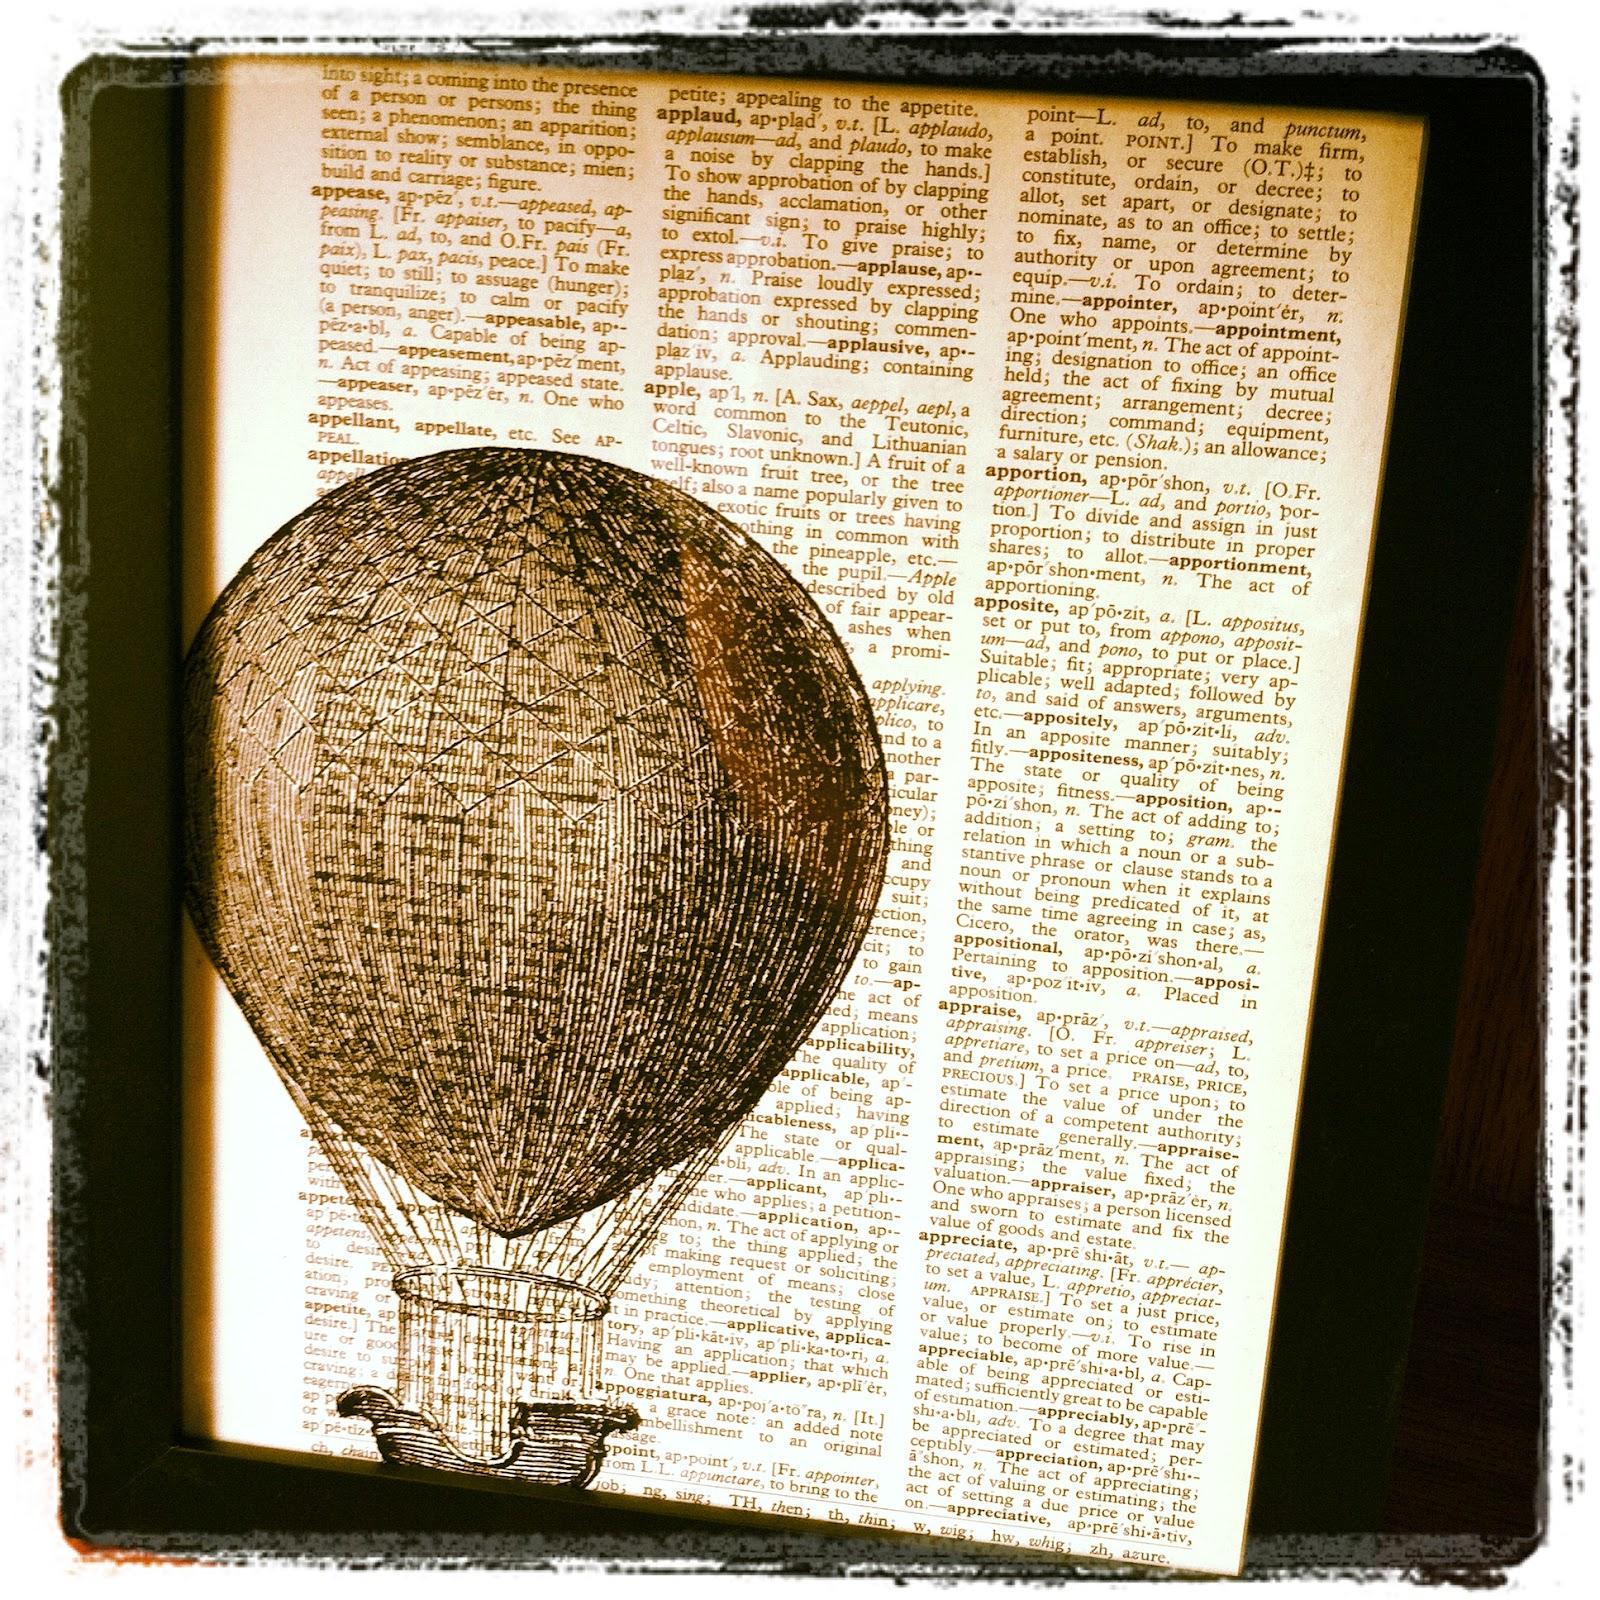 http://1.bp.blogspot.com/-HOiiXHvm8Hg/UAlttwQxg2I/AAAAAAAABwc/4aaiKh1ySs0/s1600/Dictionary+Print.JPG